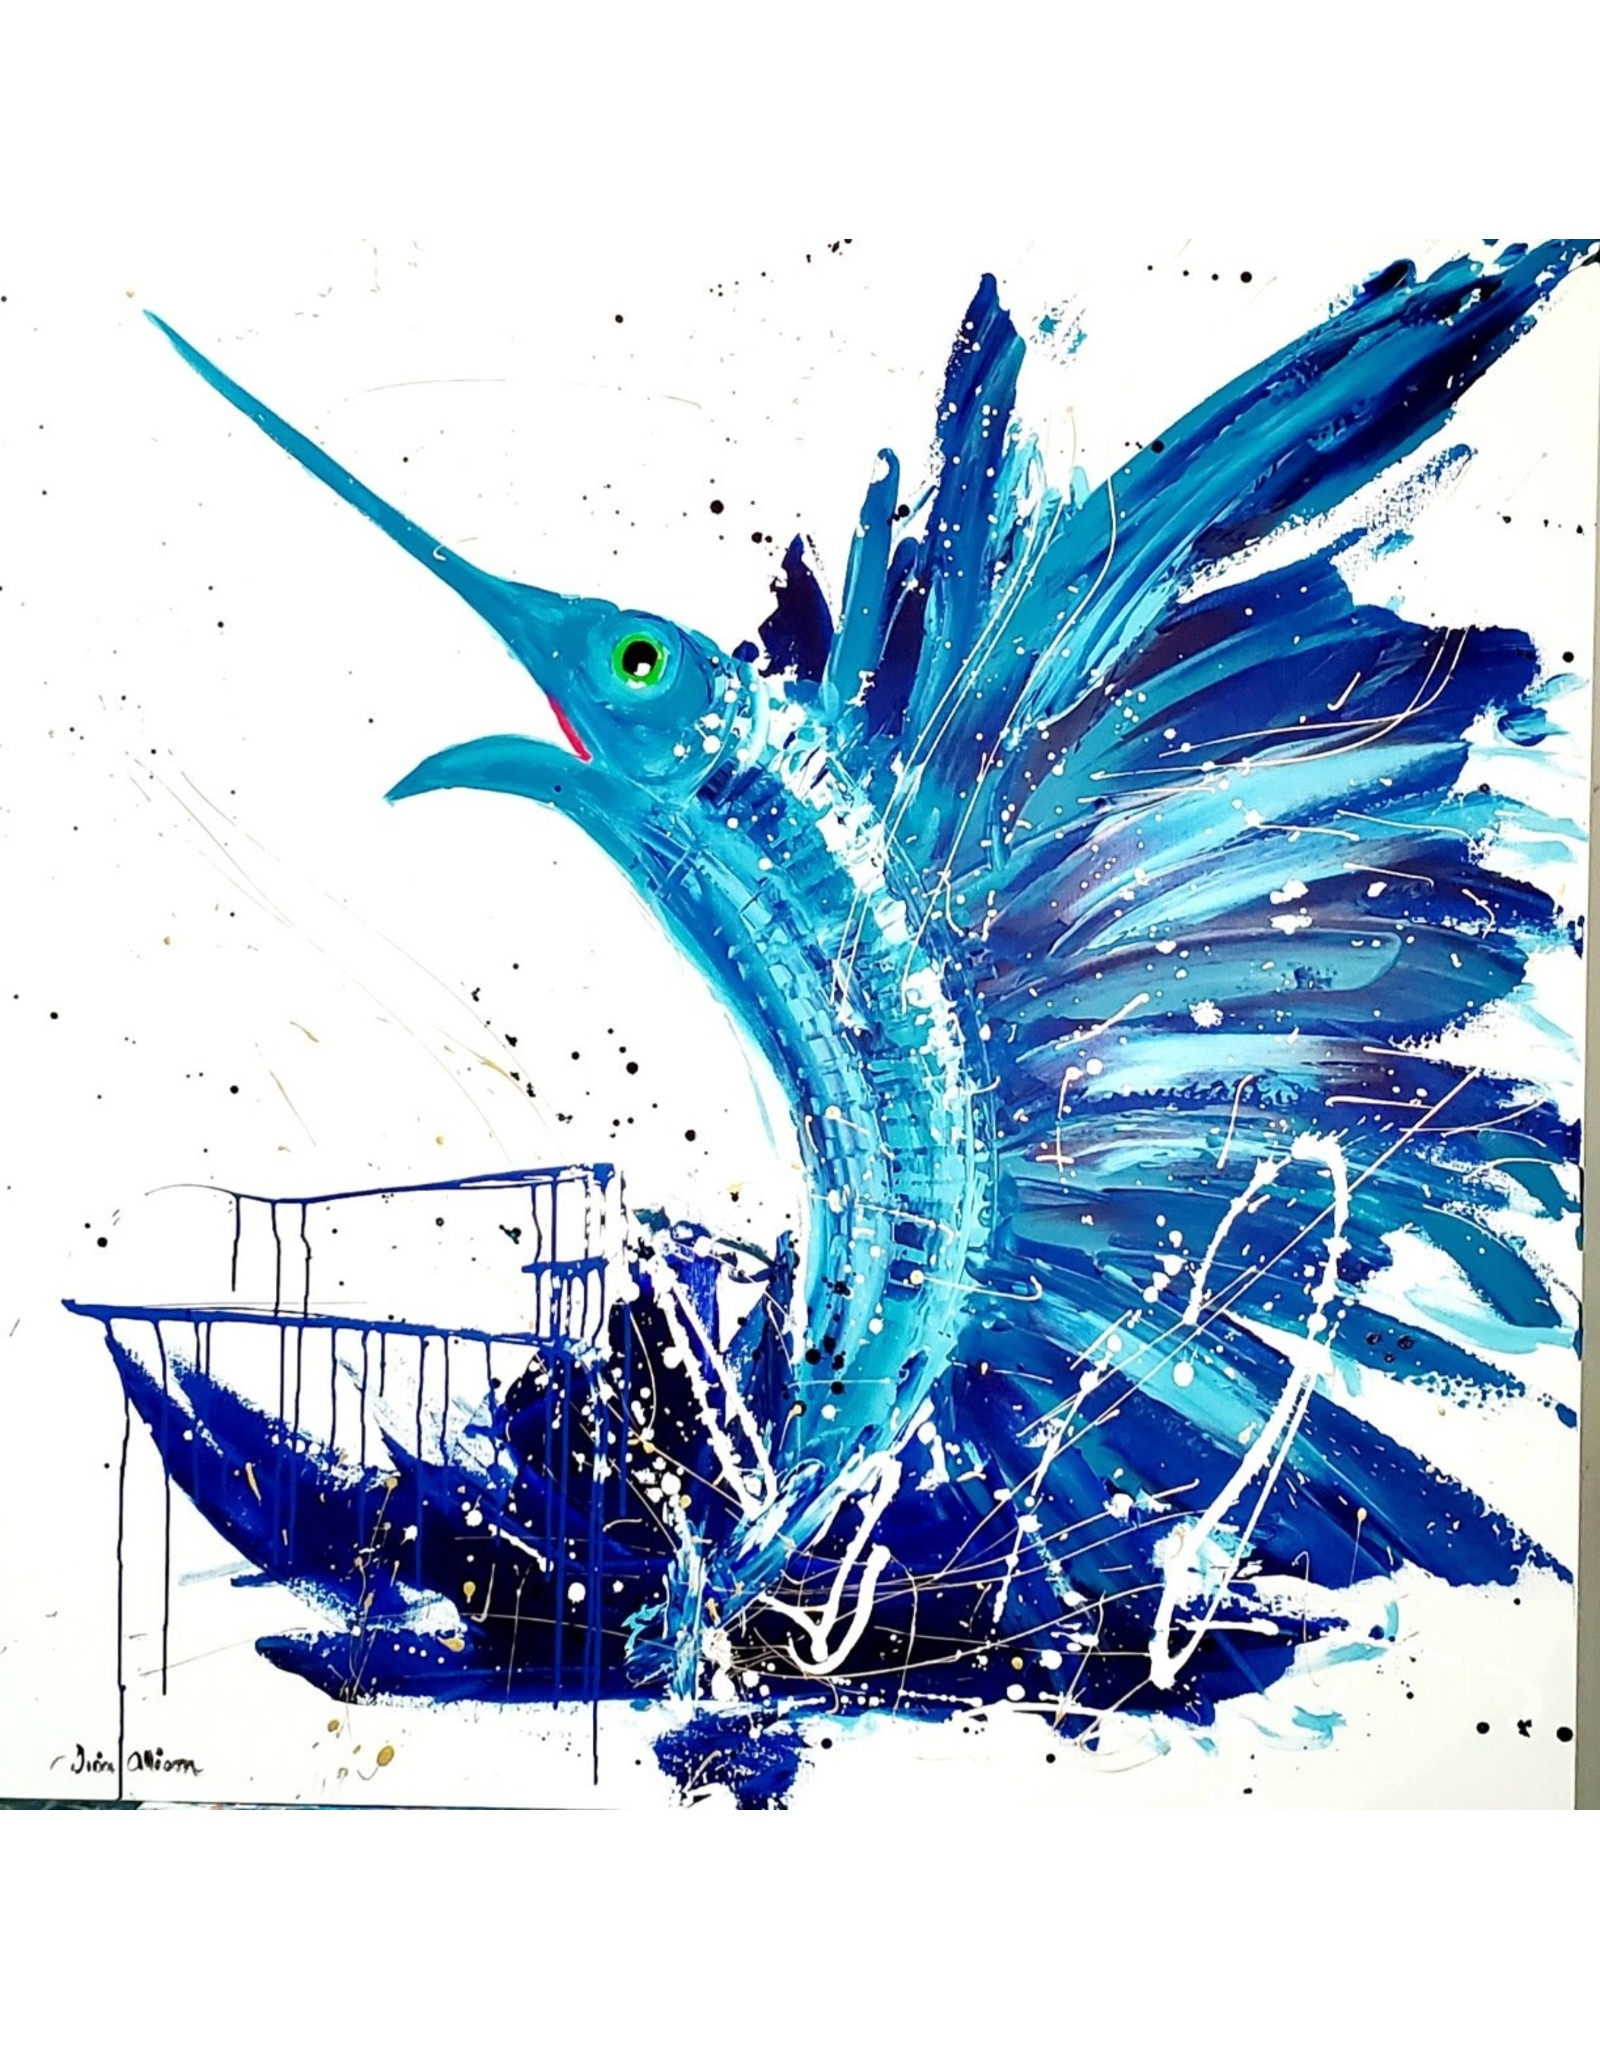 "Lisa Jill Allison HECK YAH! sailfish/original acrylic on GW Canvas, 48x48"" LISA"